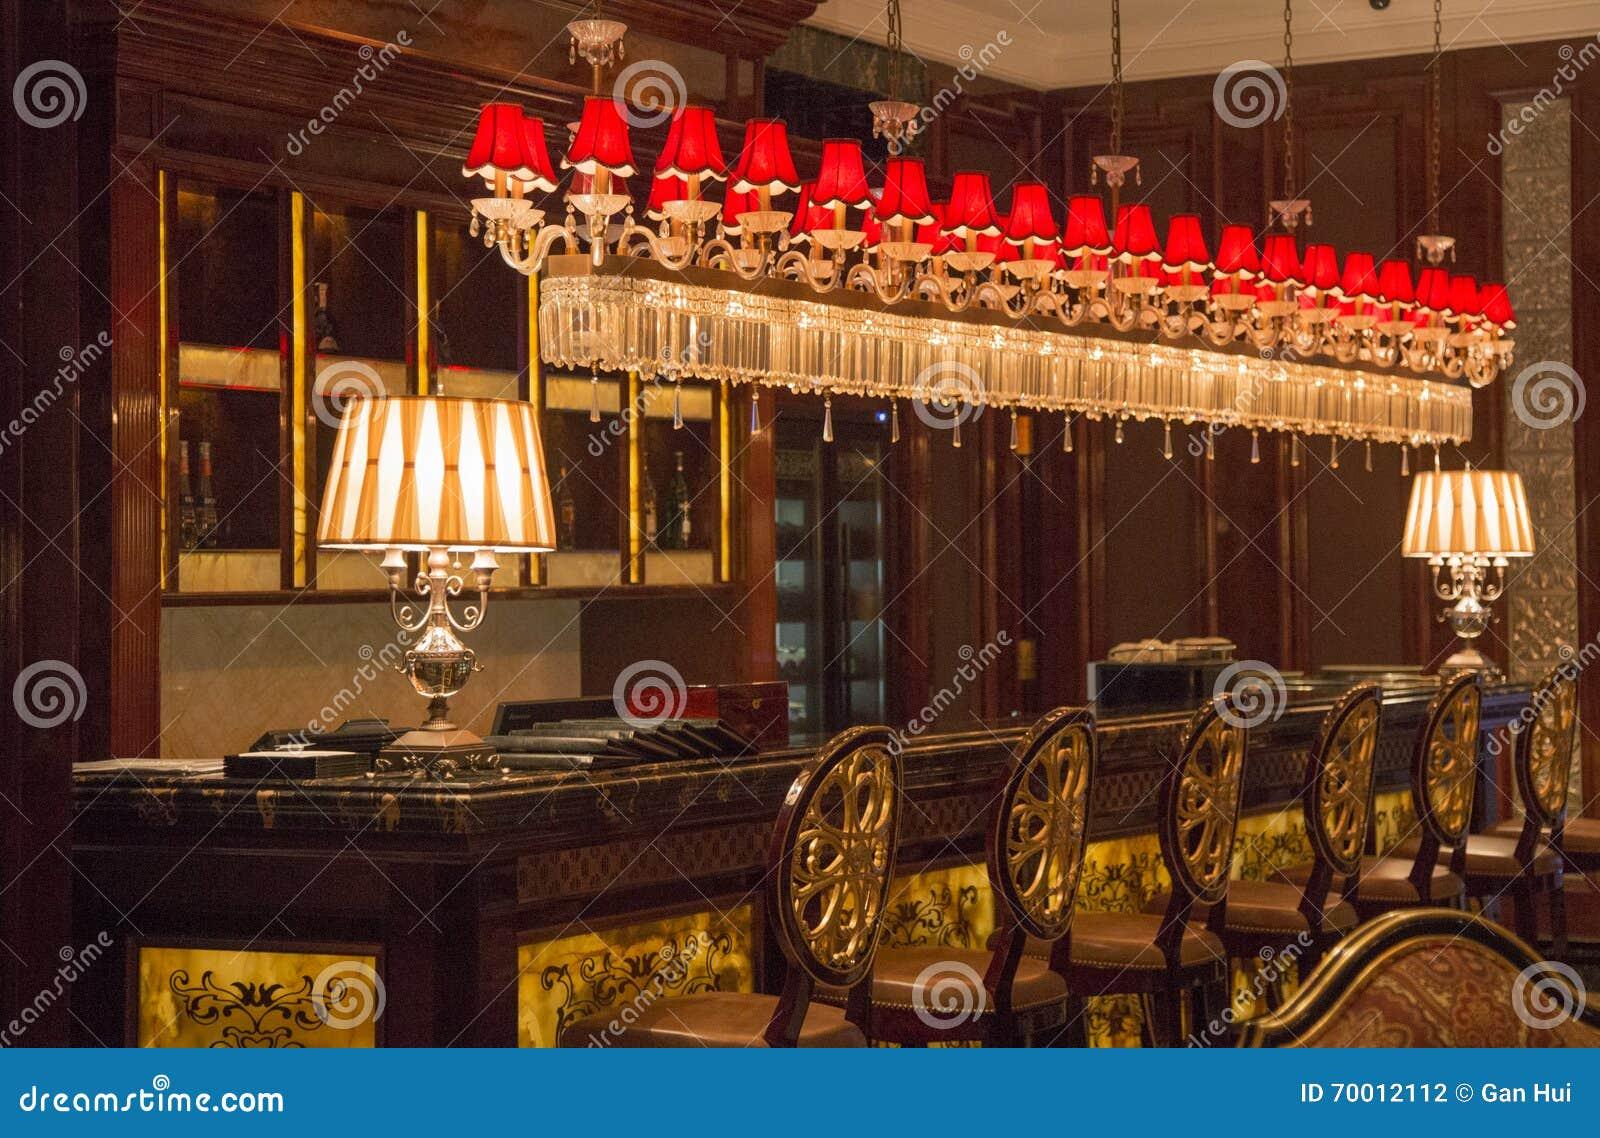 Interior bar stock illustration. Illustration of beautiful - 70012112